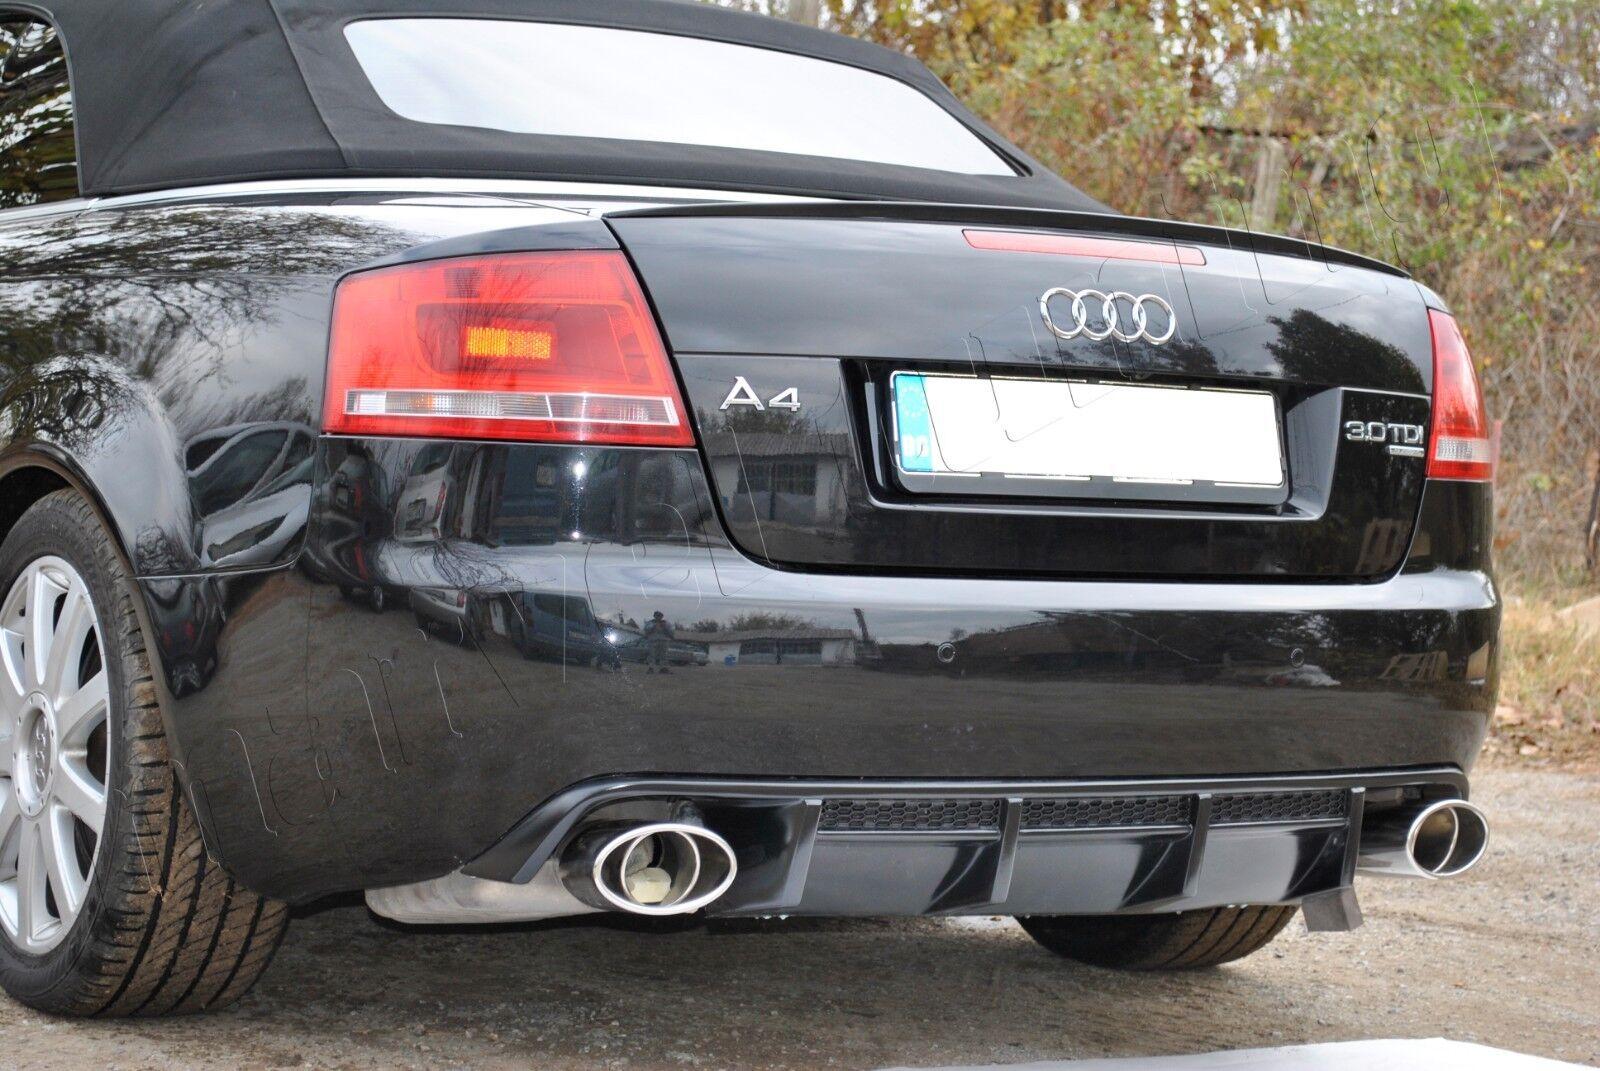 Details About Audi A4 B6 B7 02 08 Cabriolet Rear Bumper Diffuser Spoiler